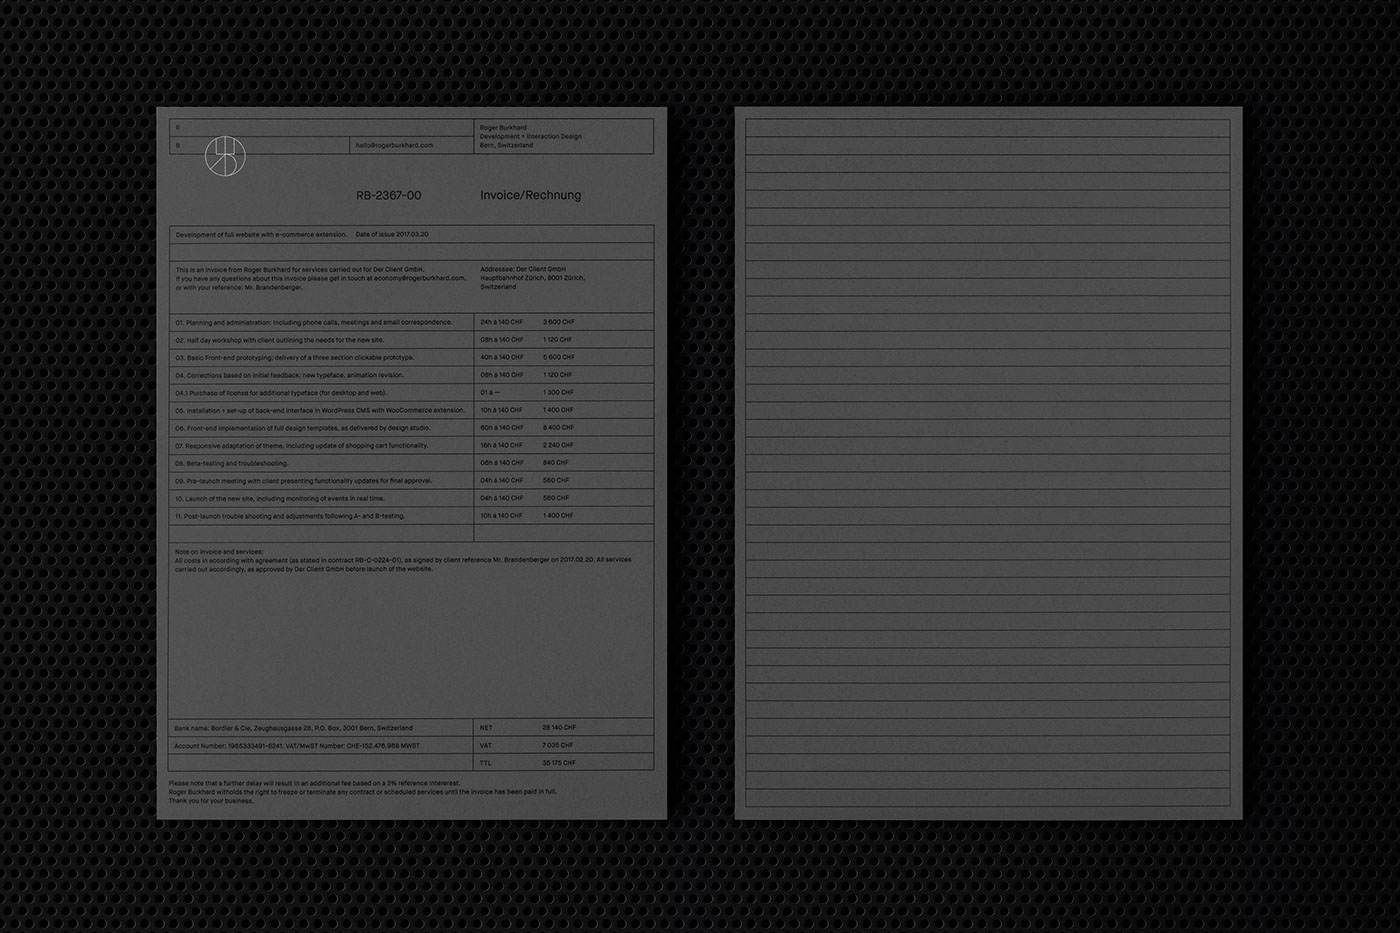 Roger Burkhard - Visual Identity, Website & Stationery on